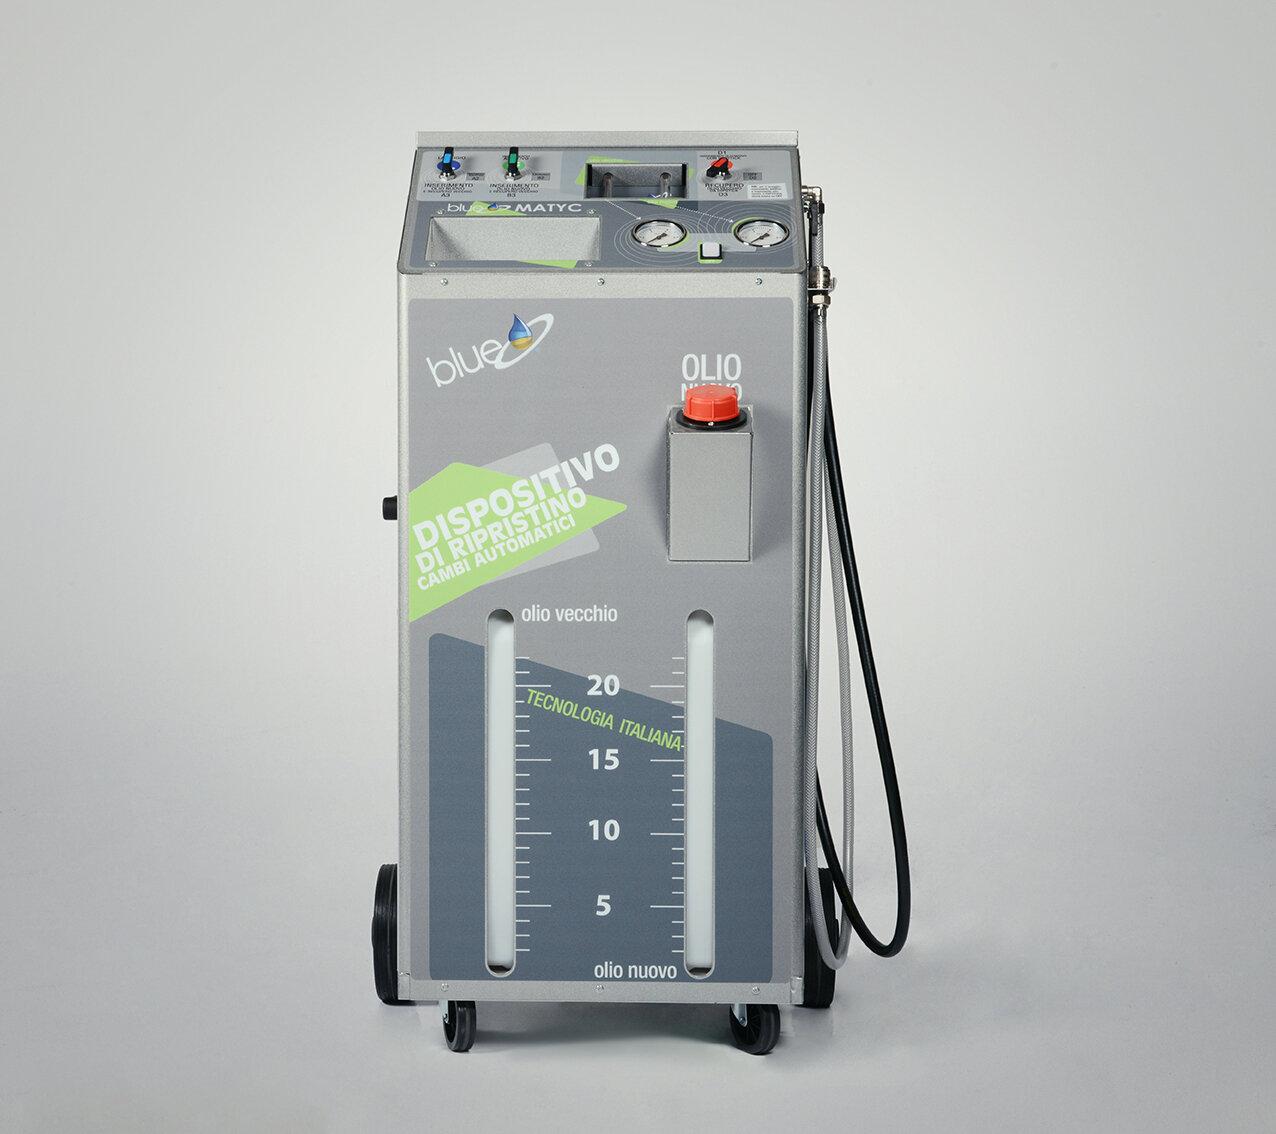 Blue Matyc + Raccoglitore olio + Banca dati KBM0101